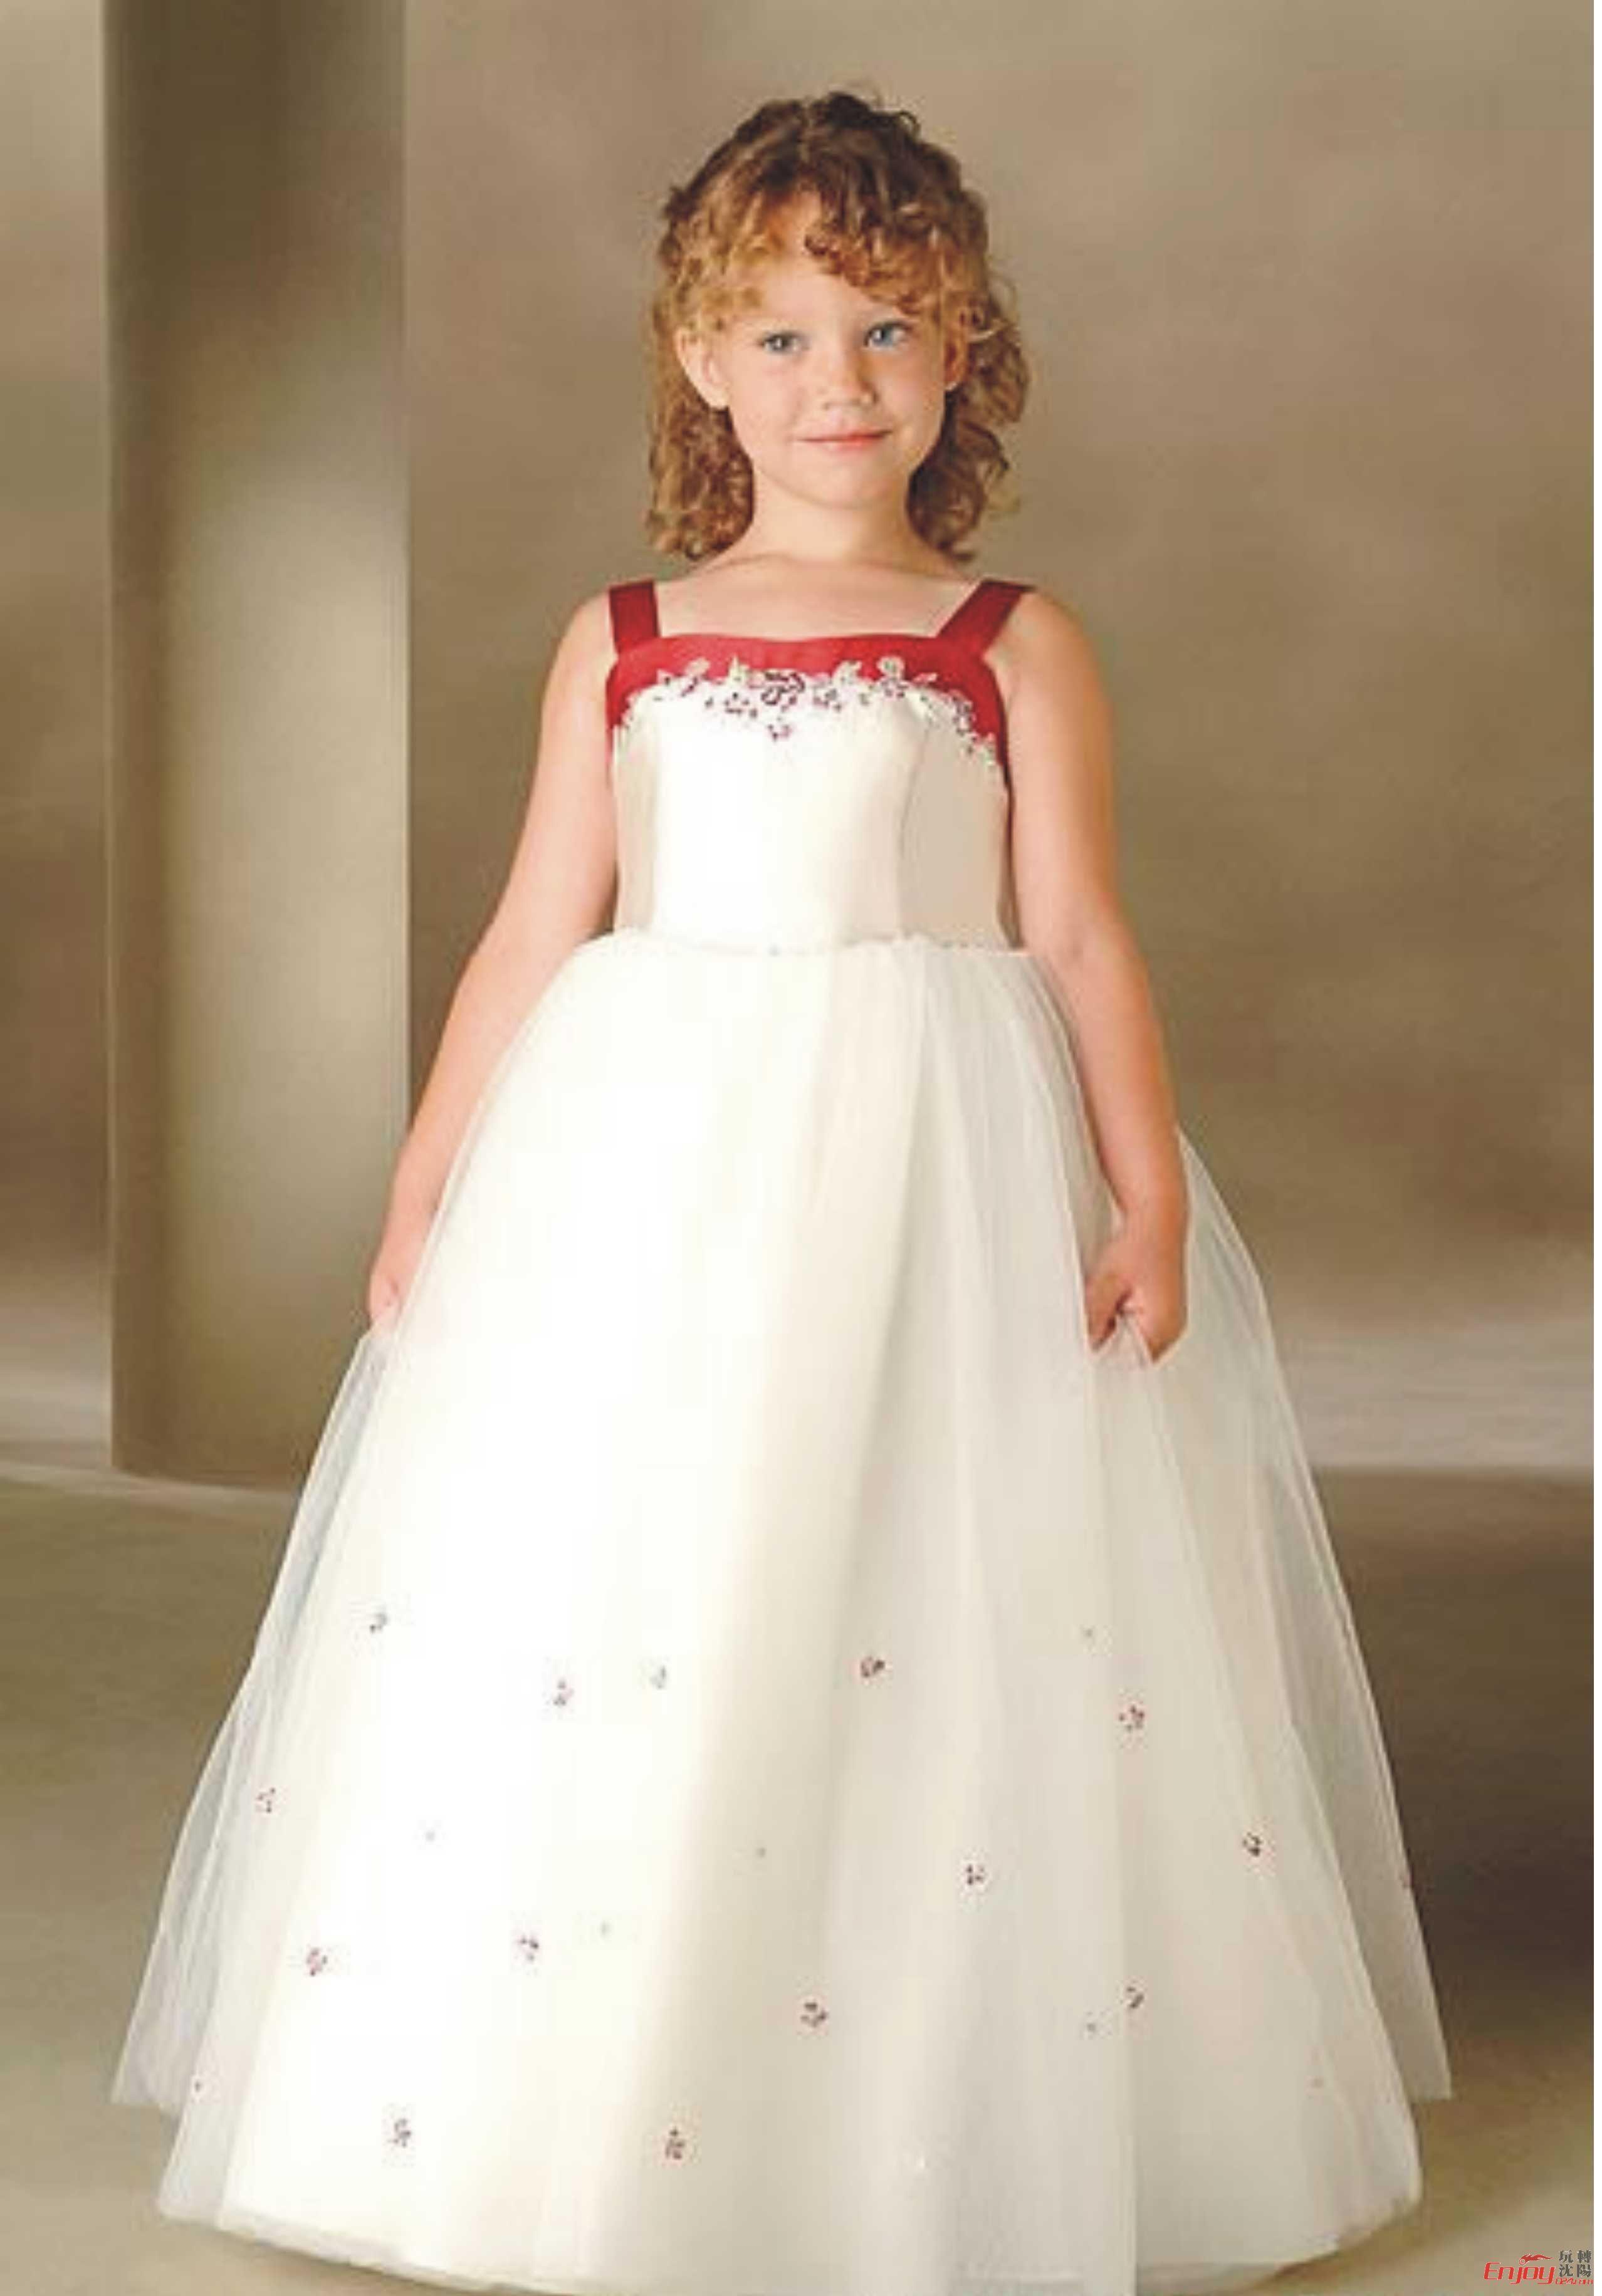 Girls wedding dress  image of flower girls outfits  flower girl dress for wedding